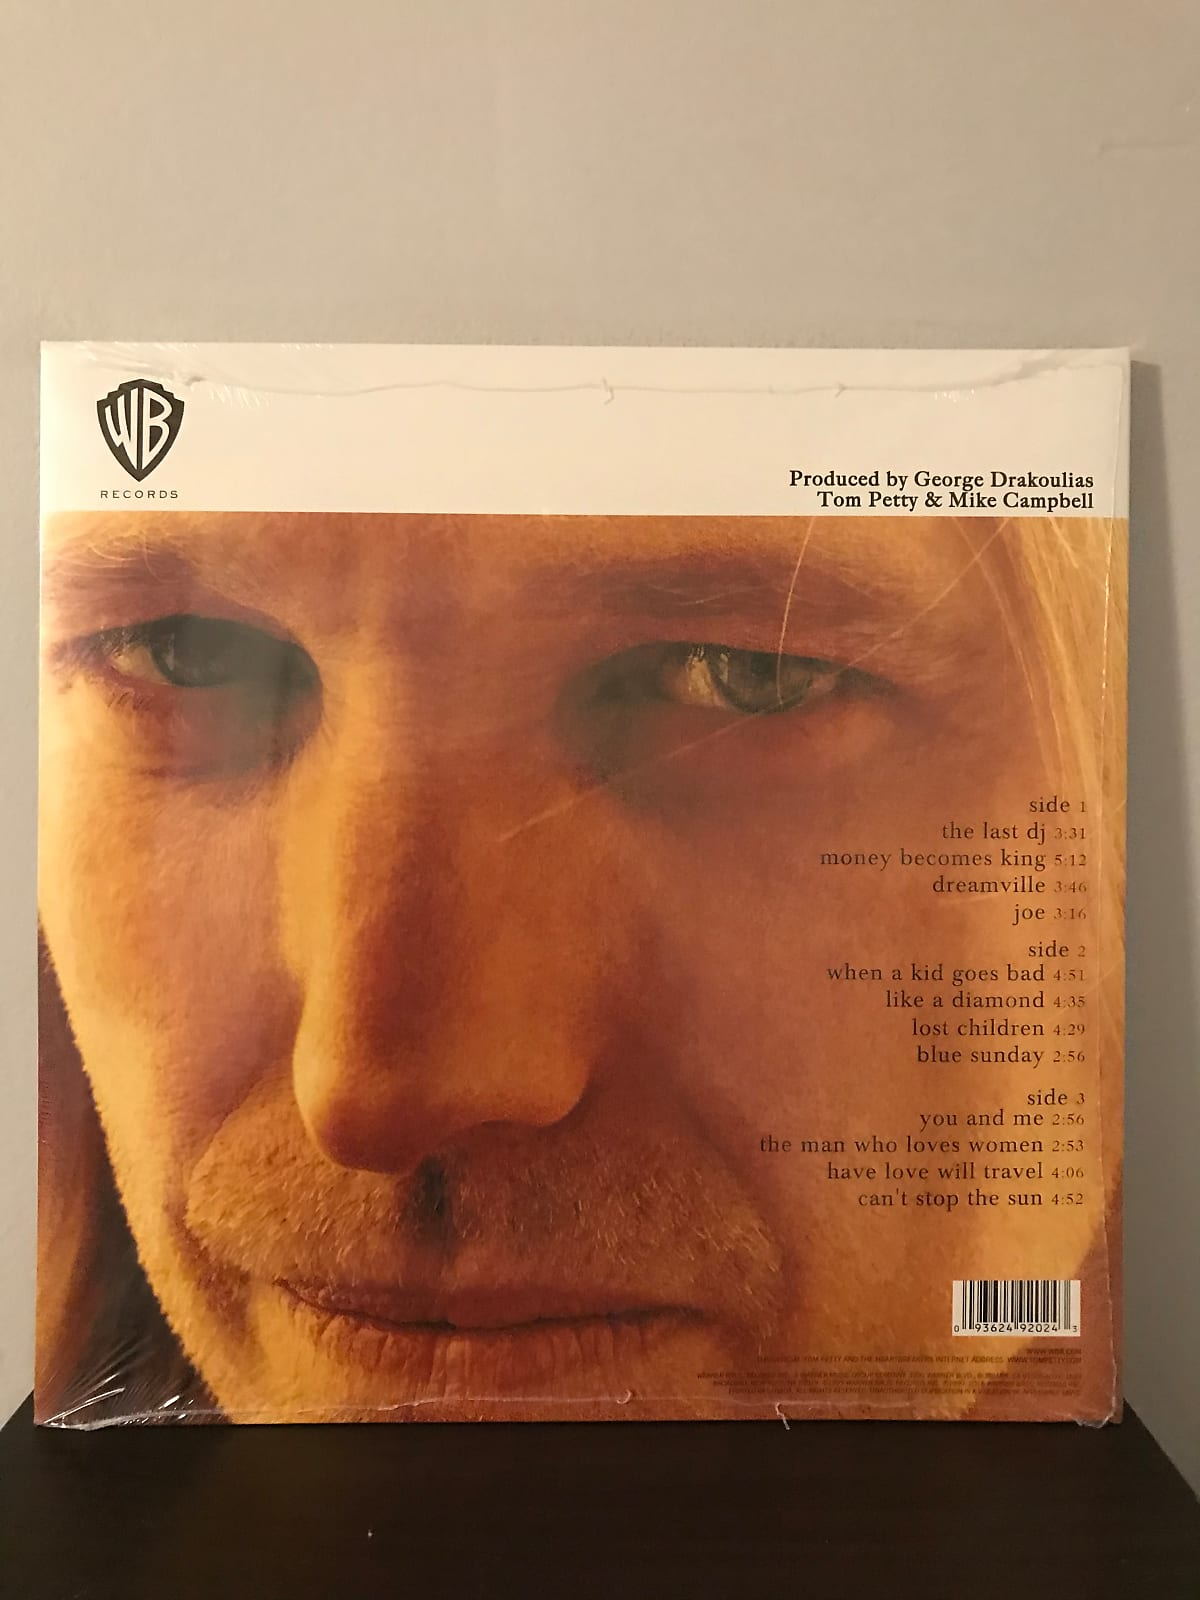 Tom Petty And The Heartbreakers - The Last DJ - Vinyl